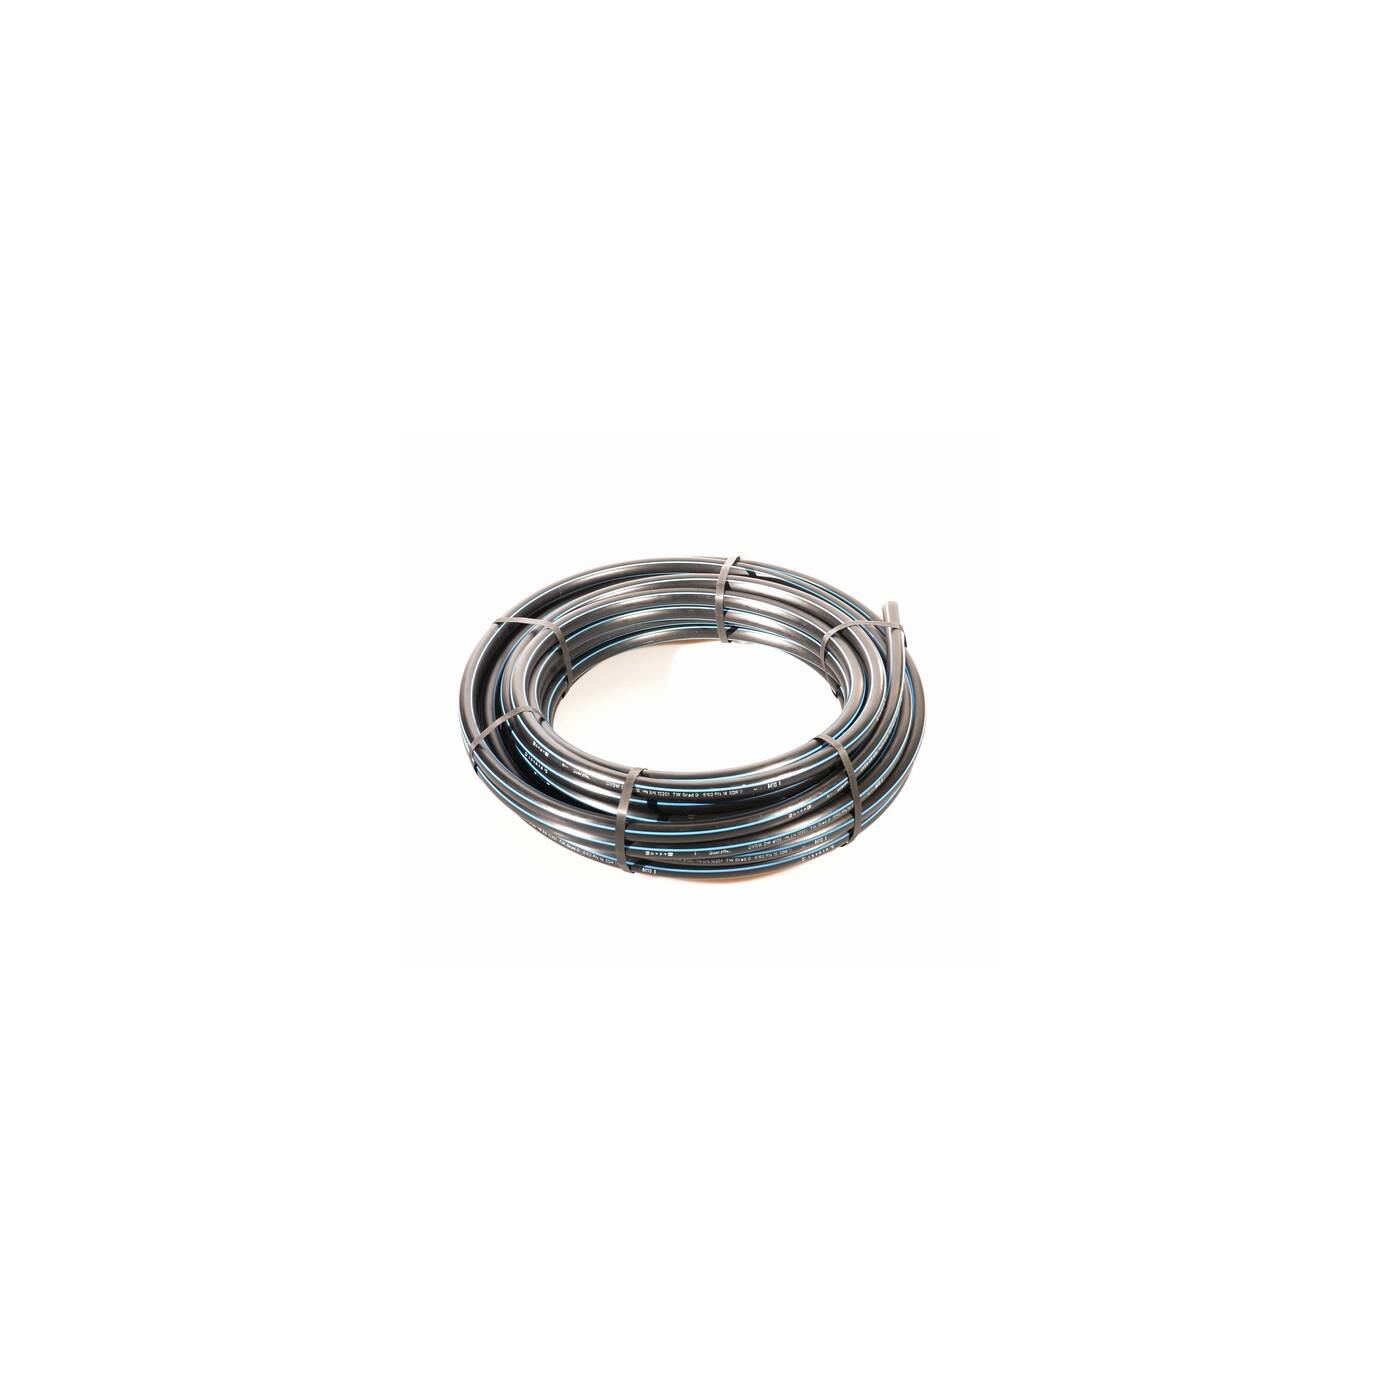 Hydro-Quip YUEL5VL-9505HE6 115V//230V Less Heat Cords Control System